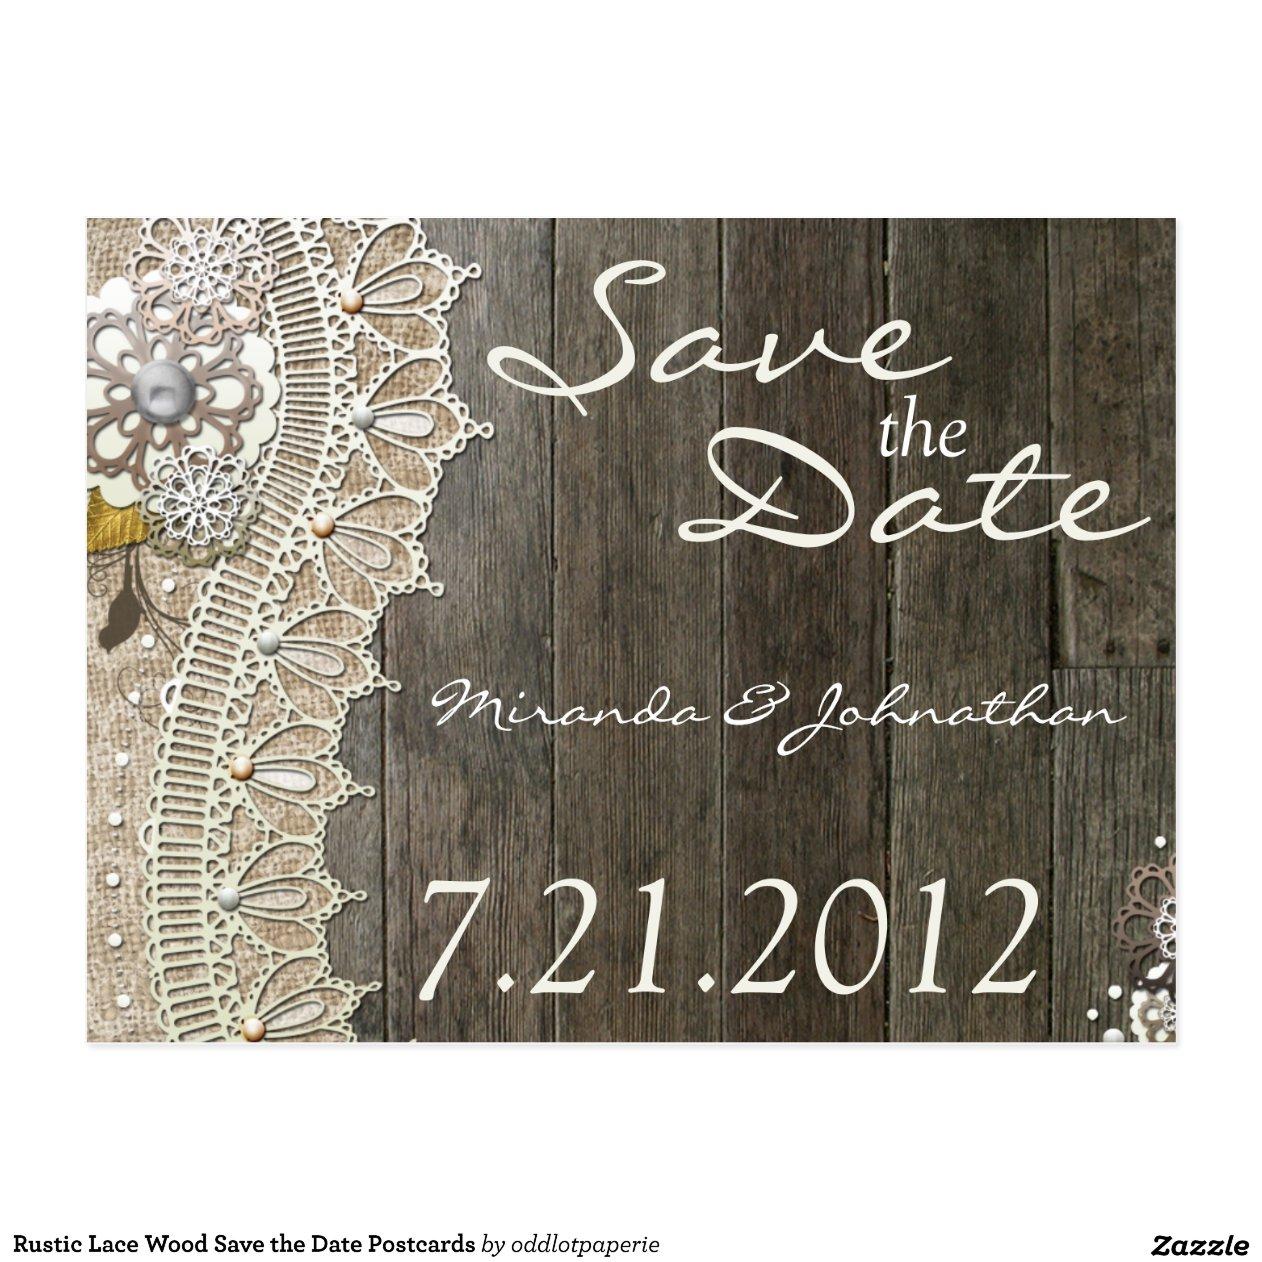 rustikale spitze holz save the date postkarten zazzle. Black Bedroom Furniture Sets. Home Design Ideas